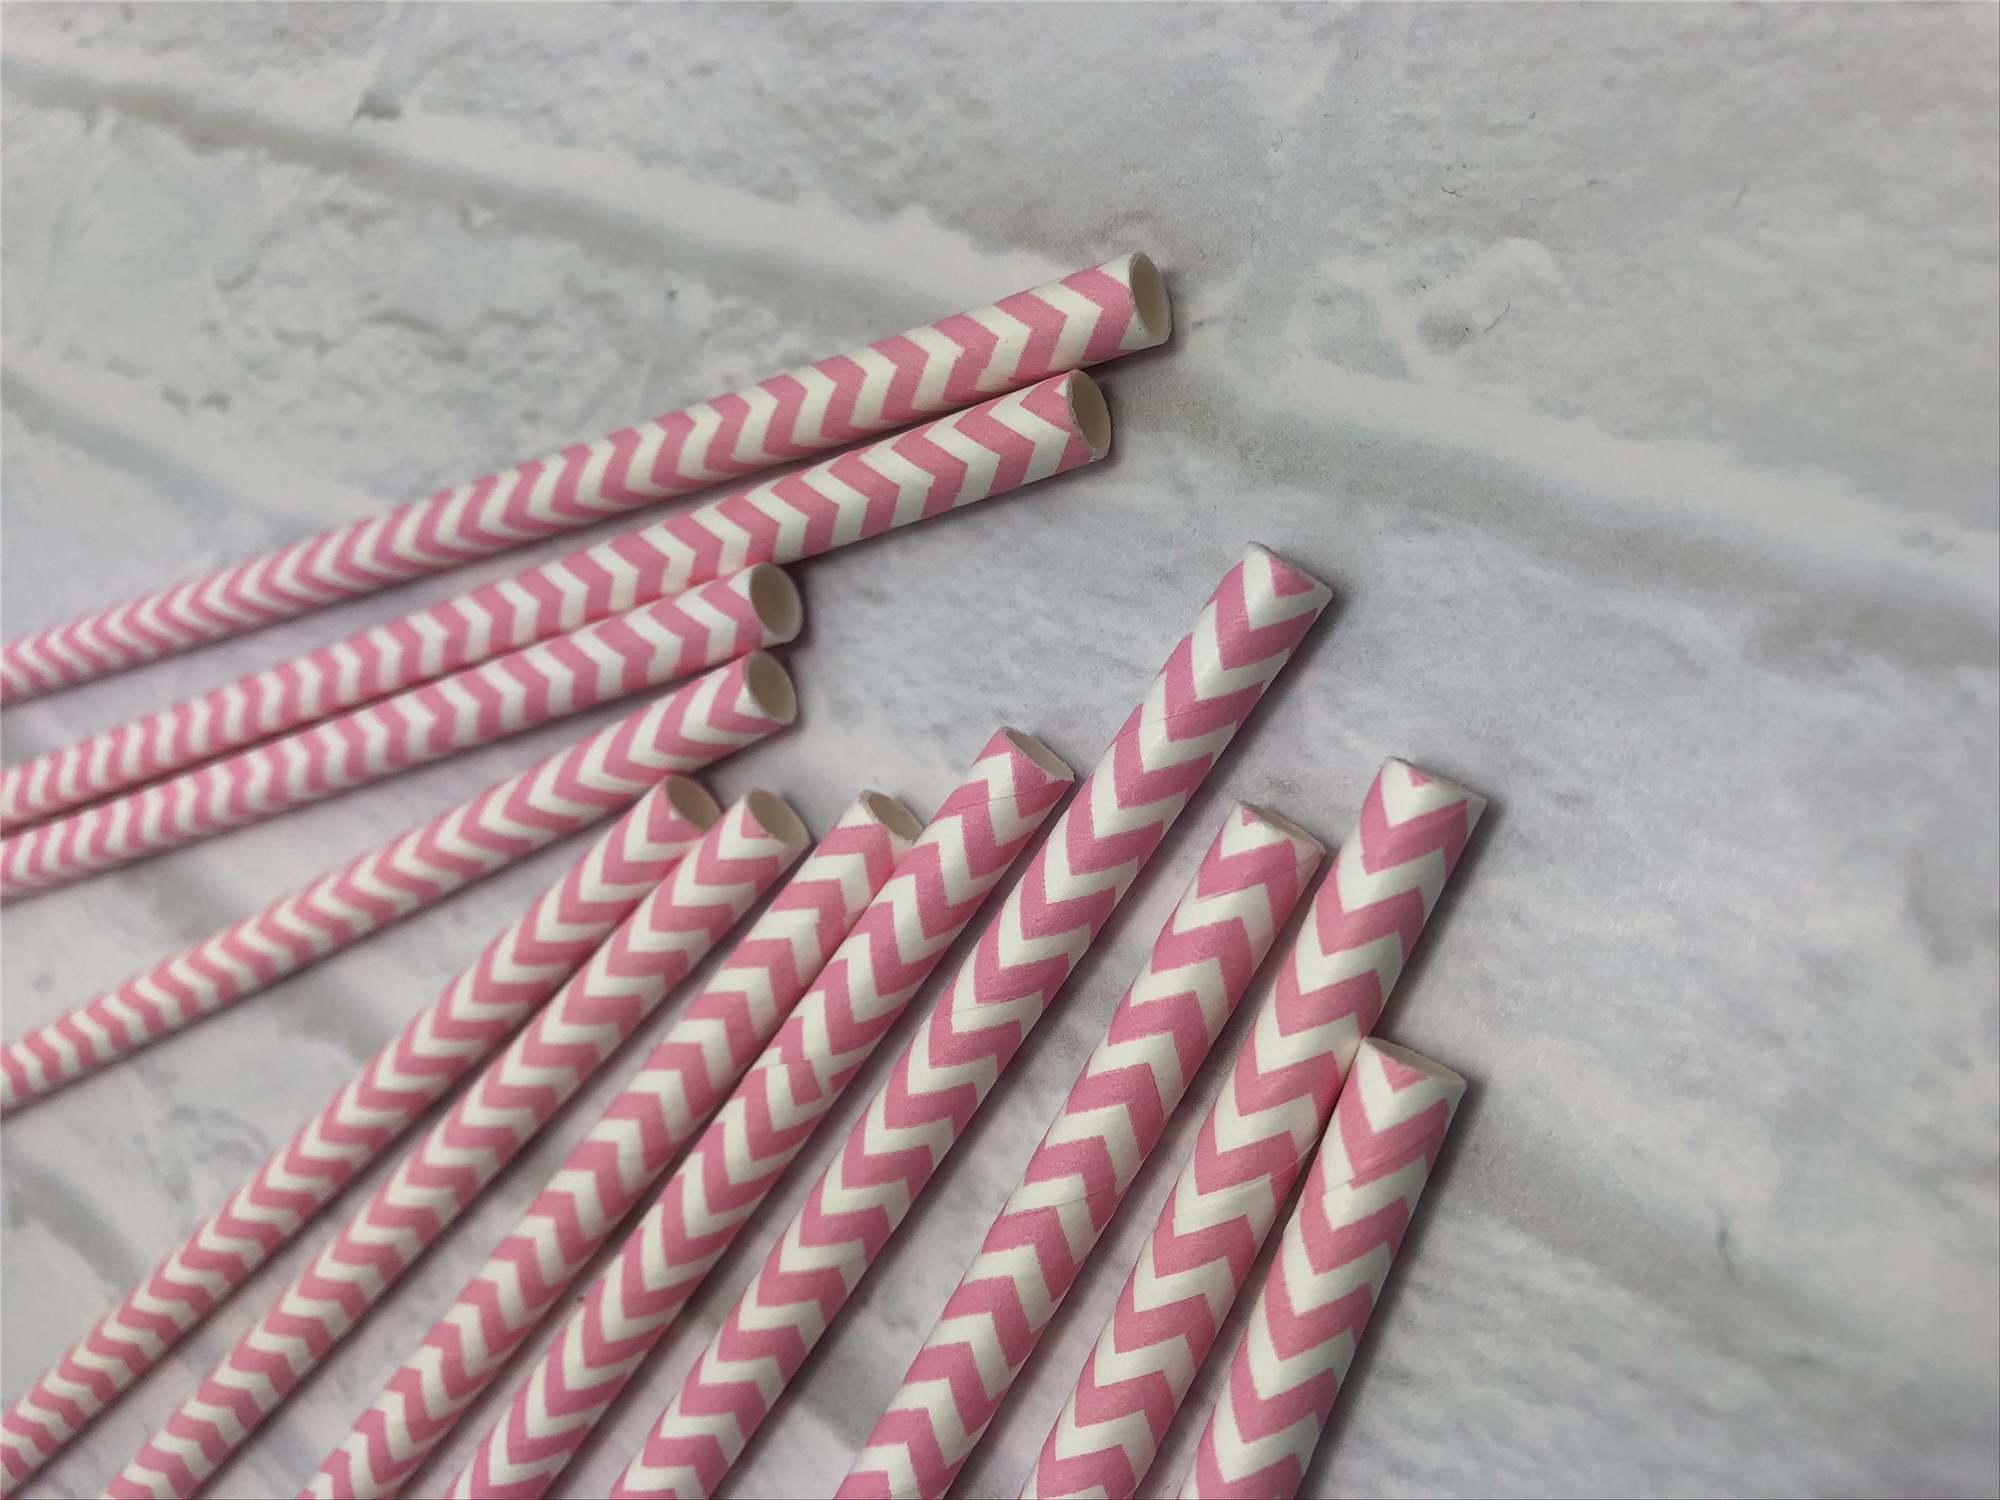 8mm pink wave Paper Straw